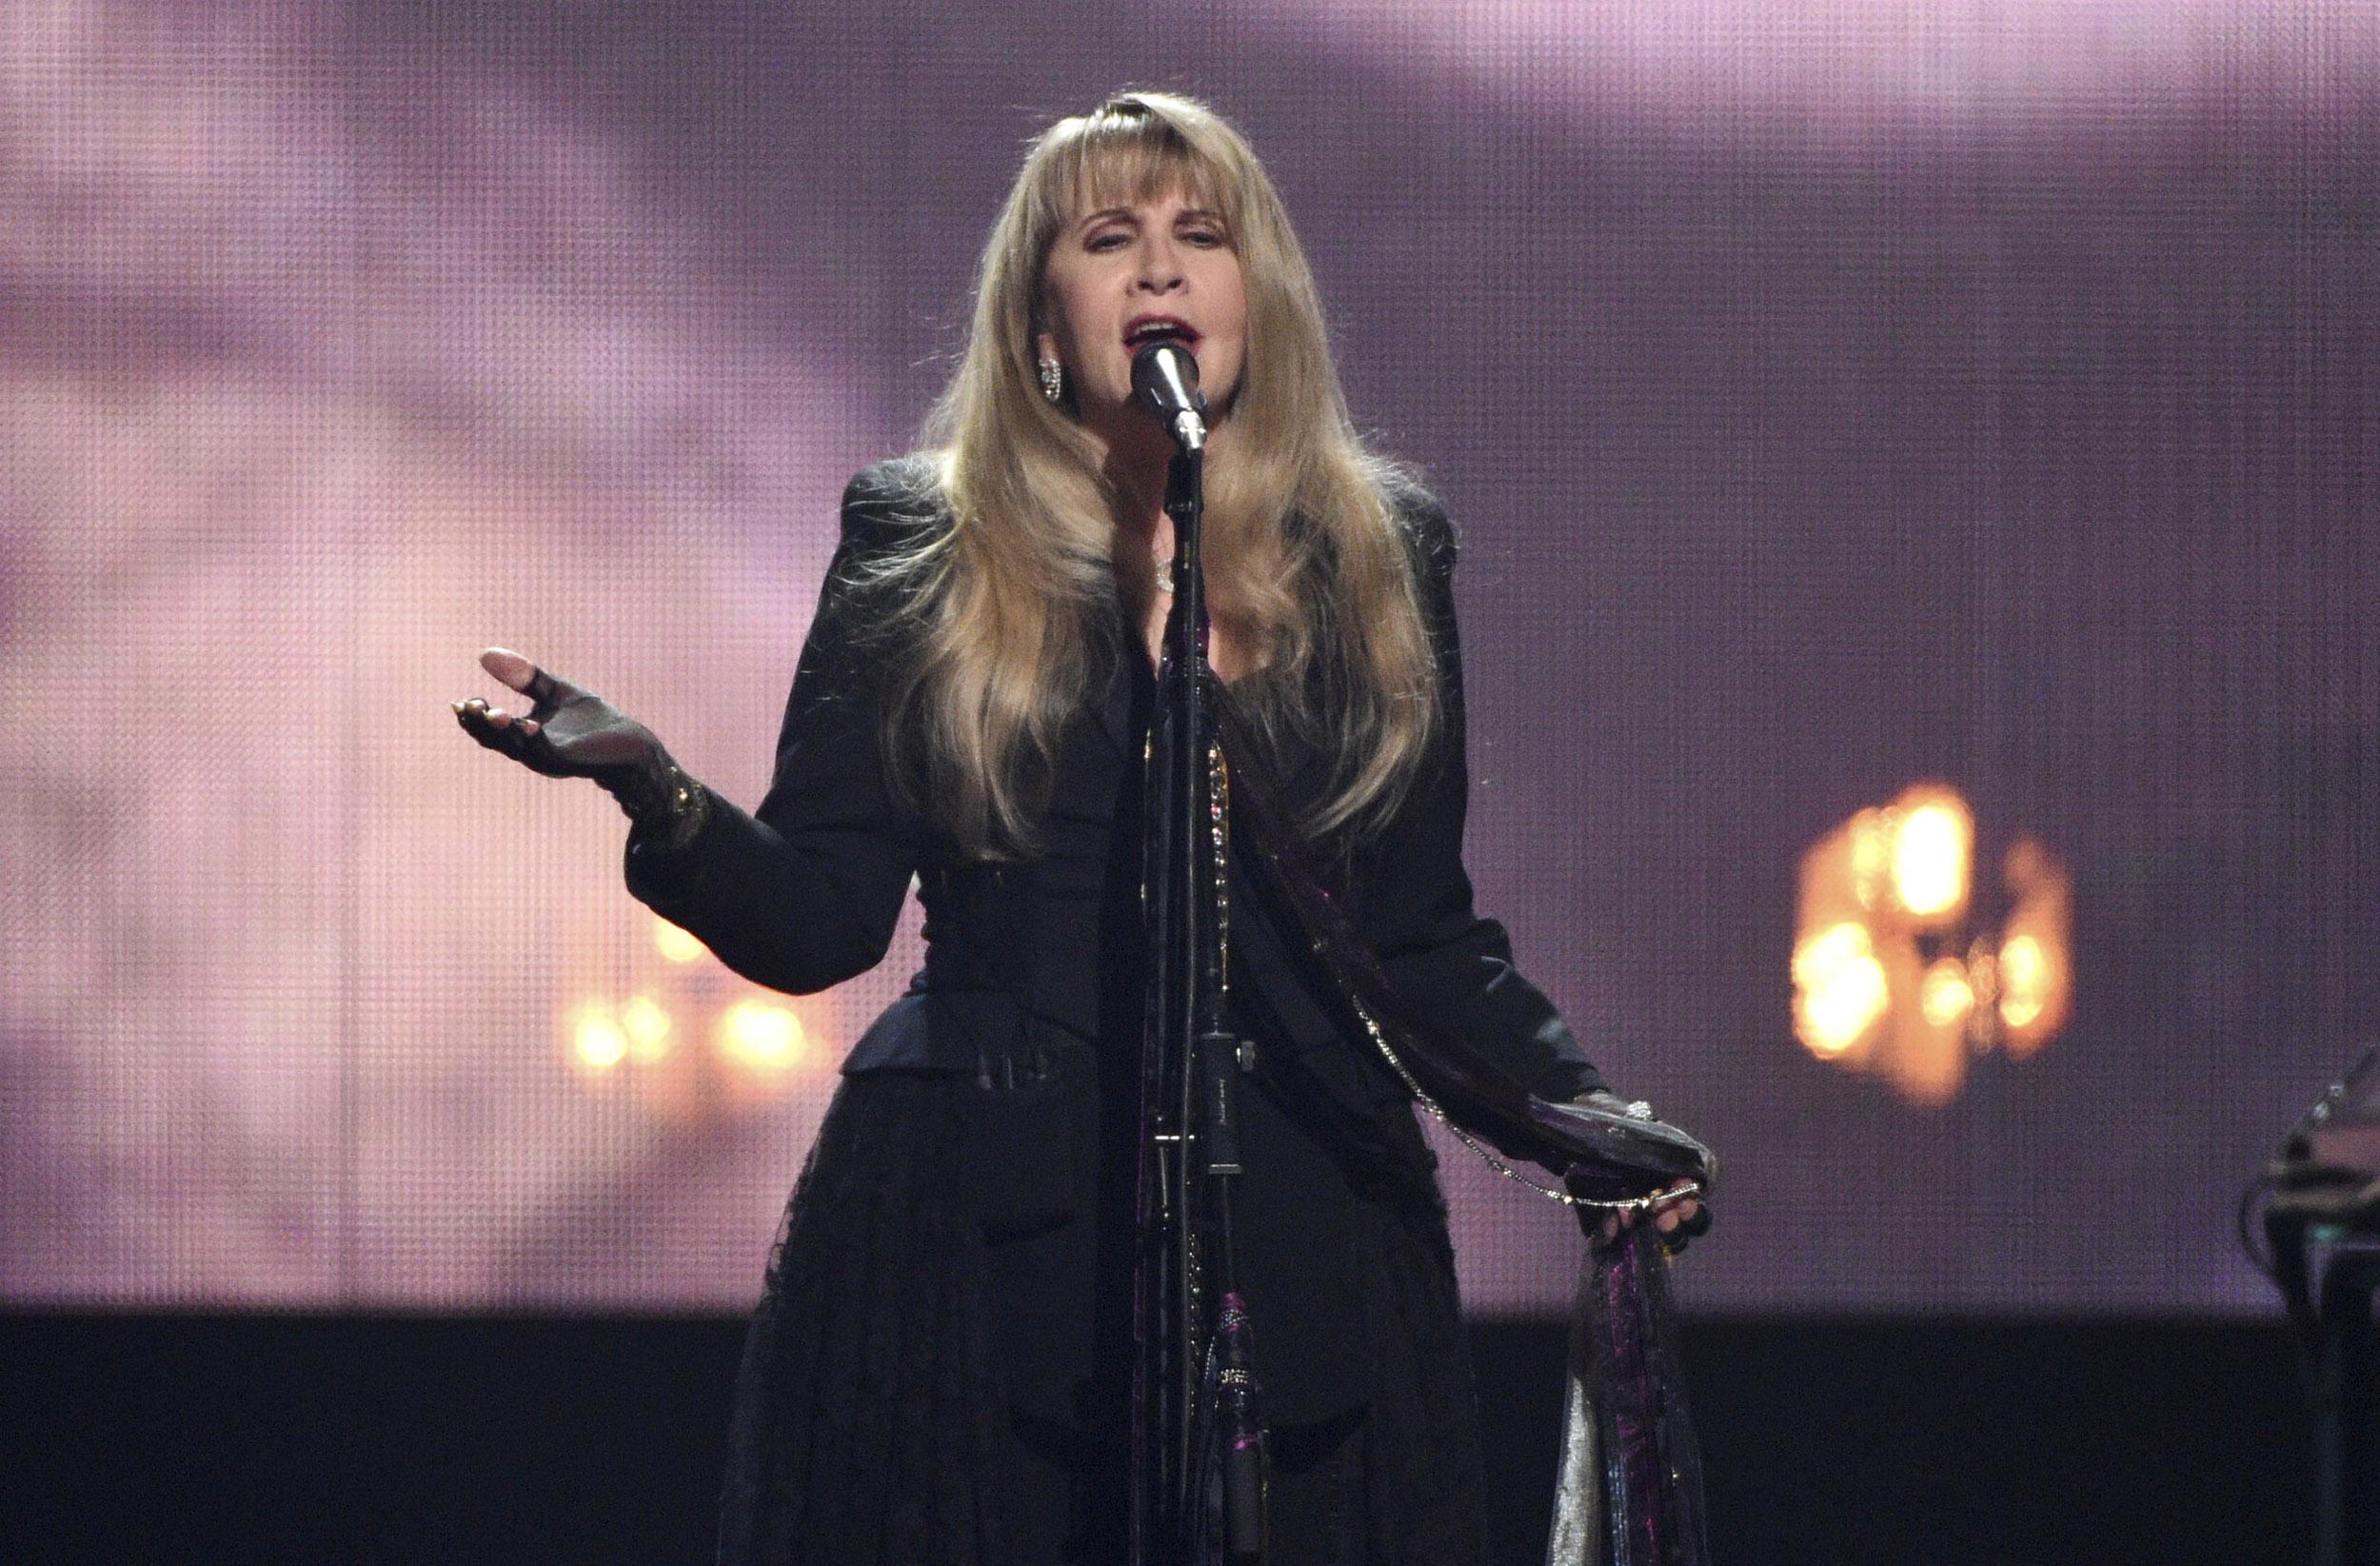 Stevie Nicks cancels all 2021 performances over coronavirus